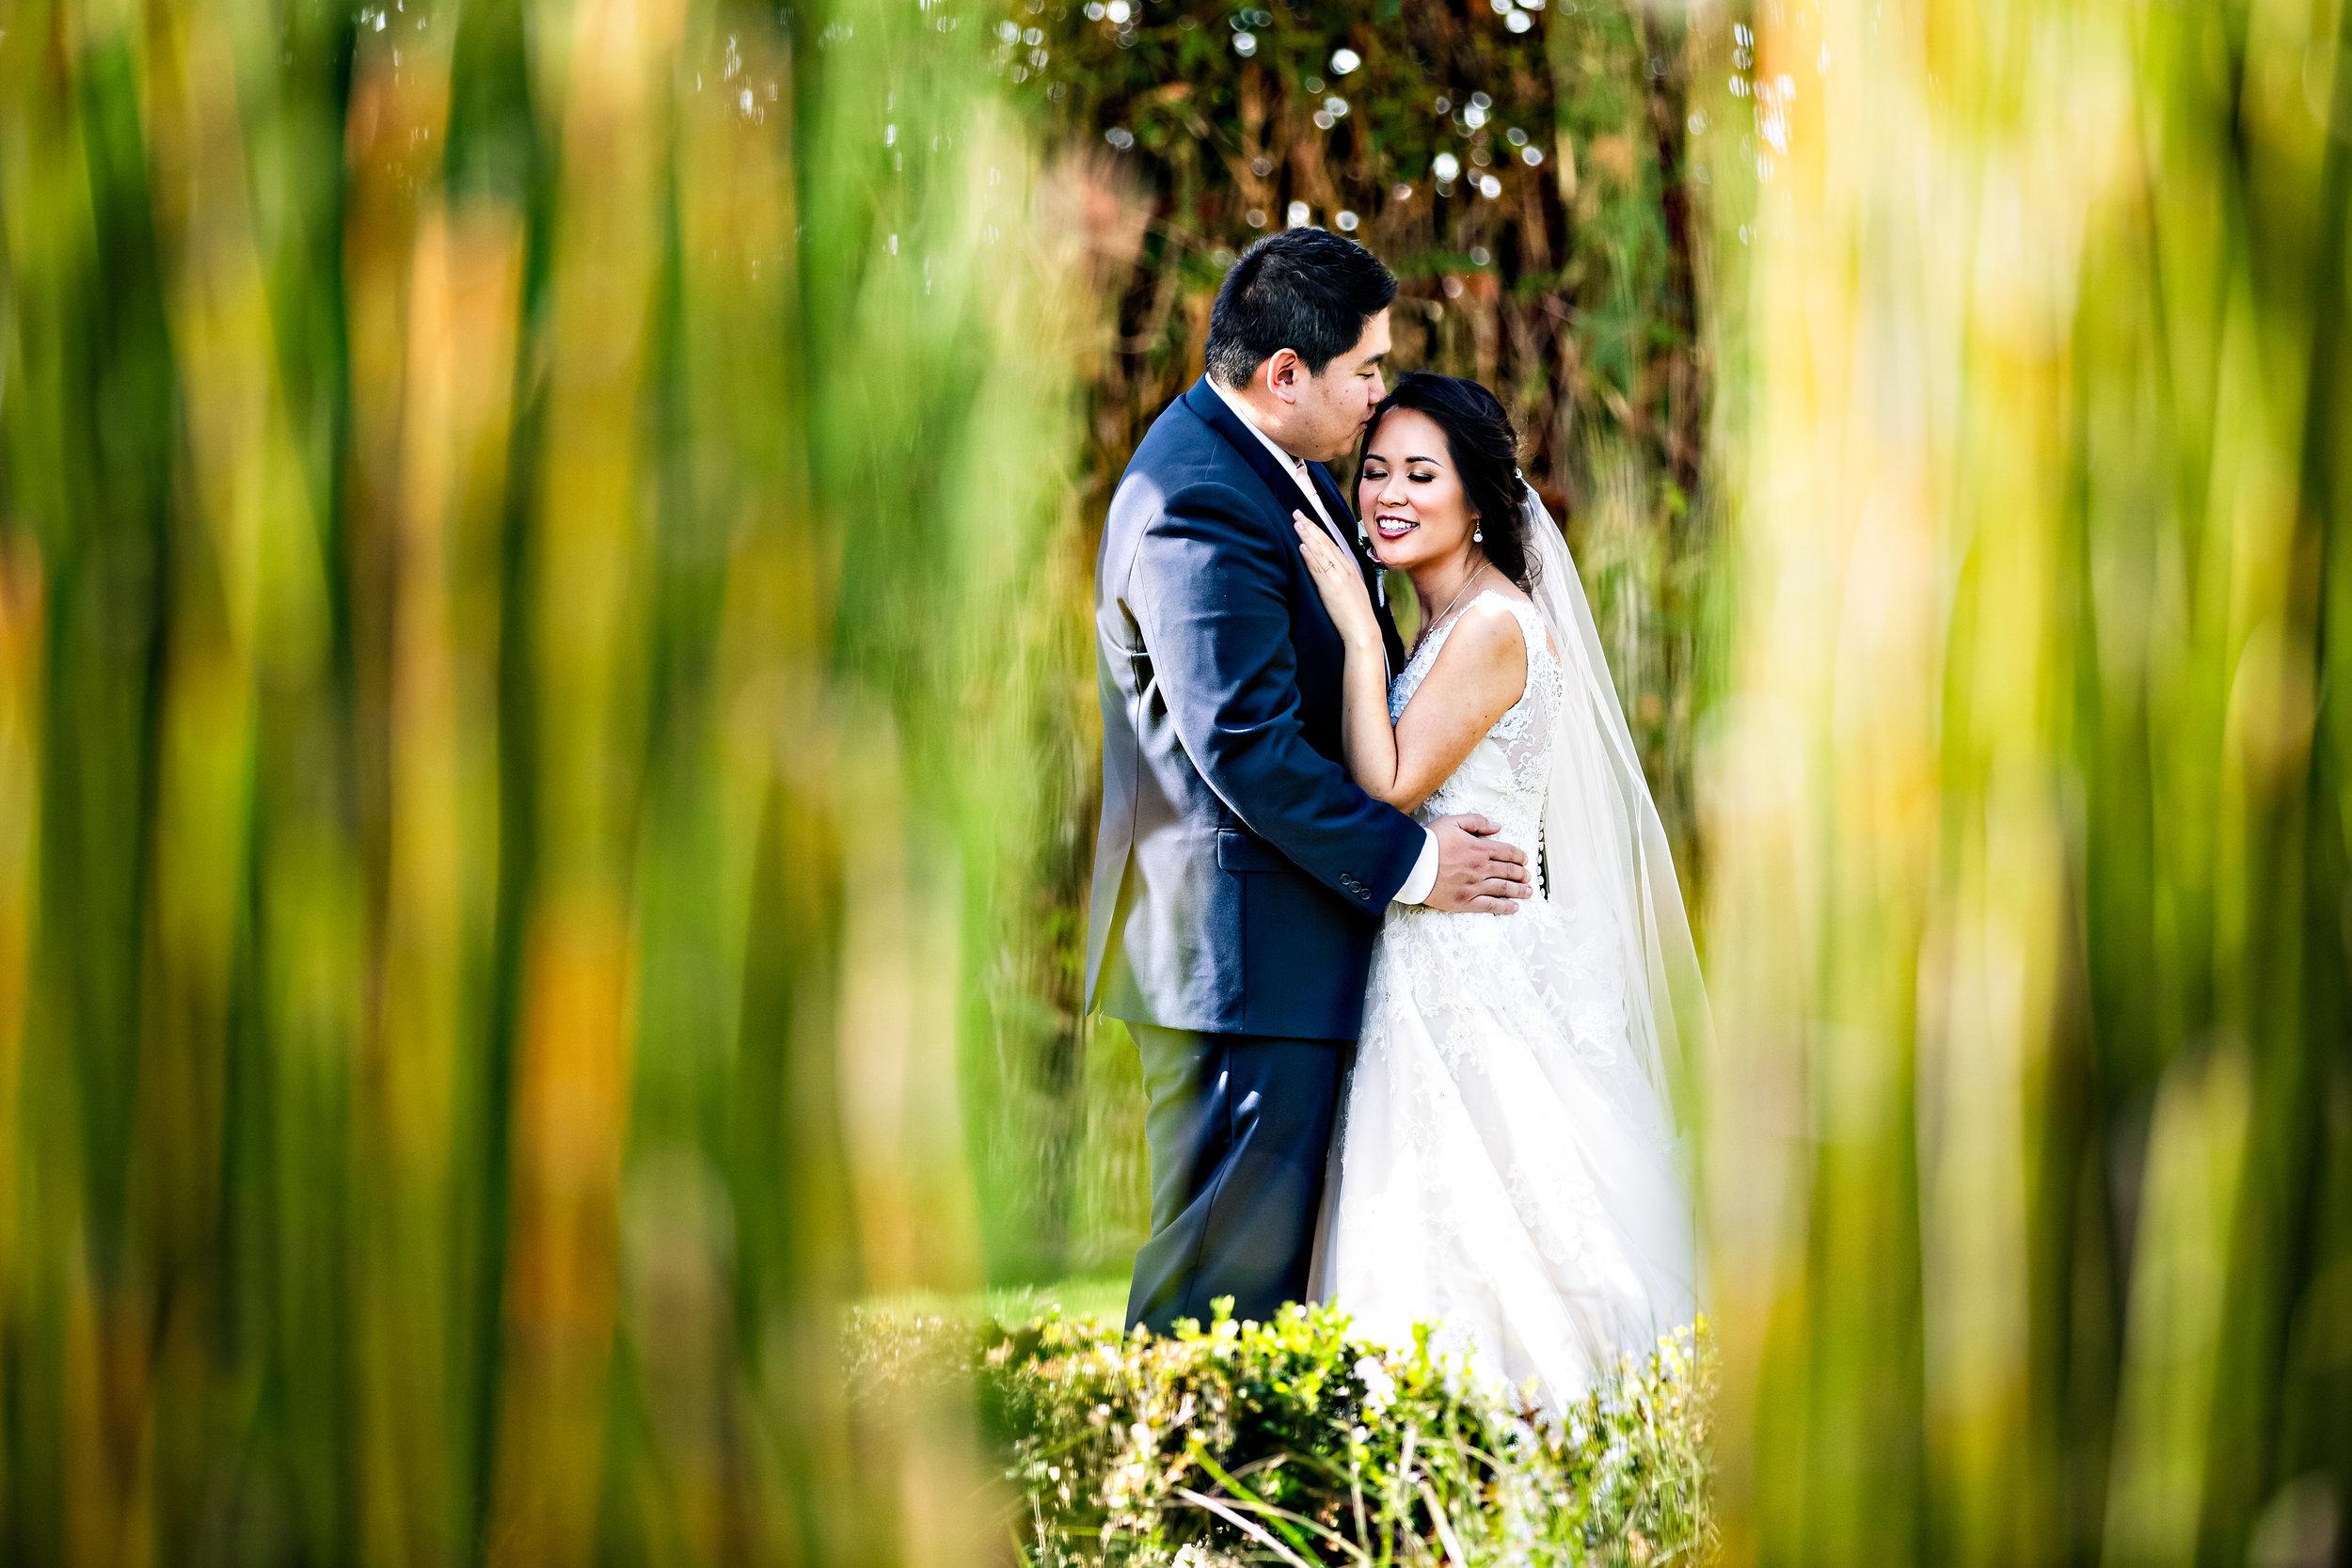 Knotts_Berry_Farm_Hotel_Wedding-217.jpg